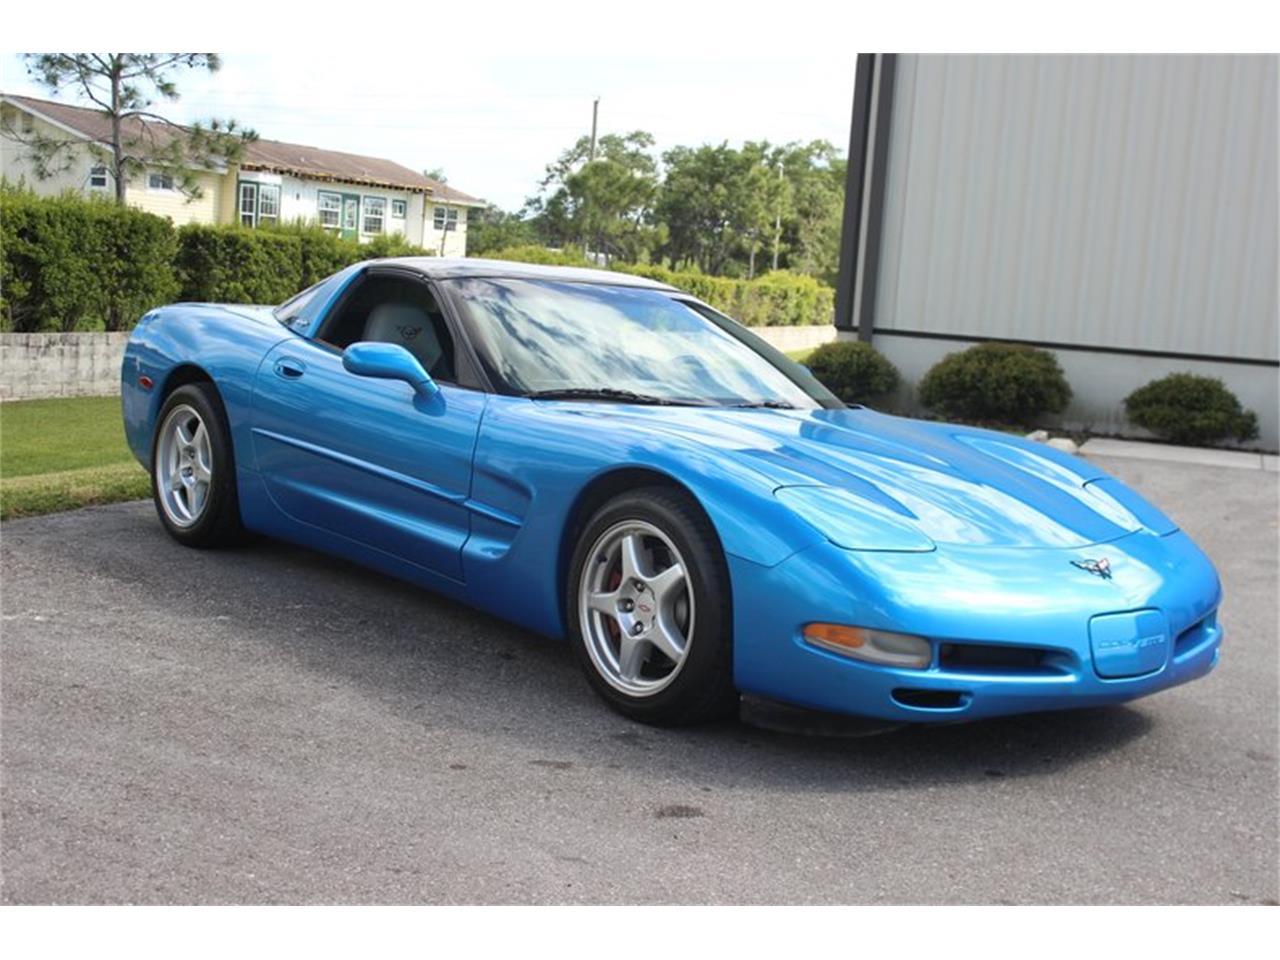 Large Picture of 1997 Chevrolet Corvette - $10,497.00 - PSRK